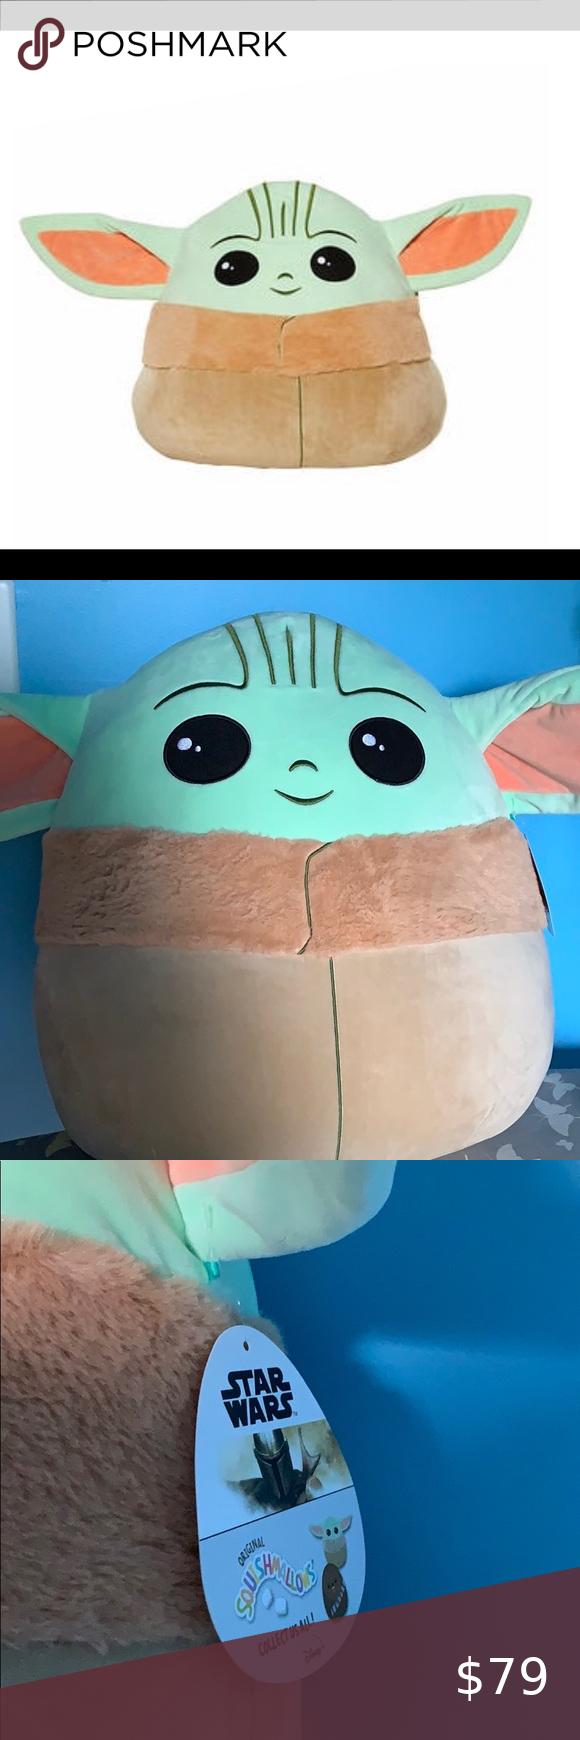 "Star Wars Mandalorian The Child XL Baby YODA 20"" Plush Squishmallow Plush NWT"